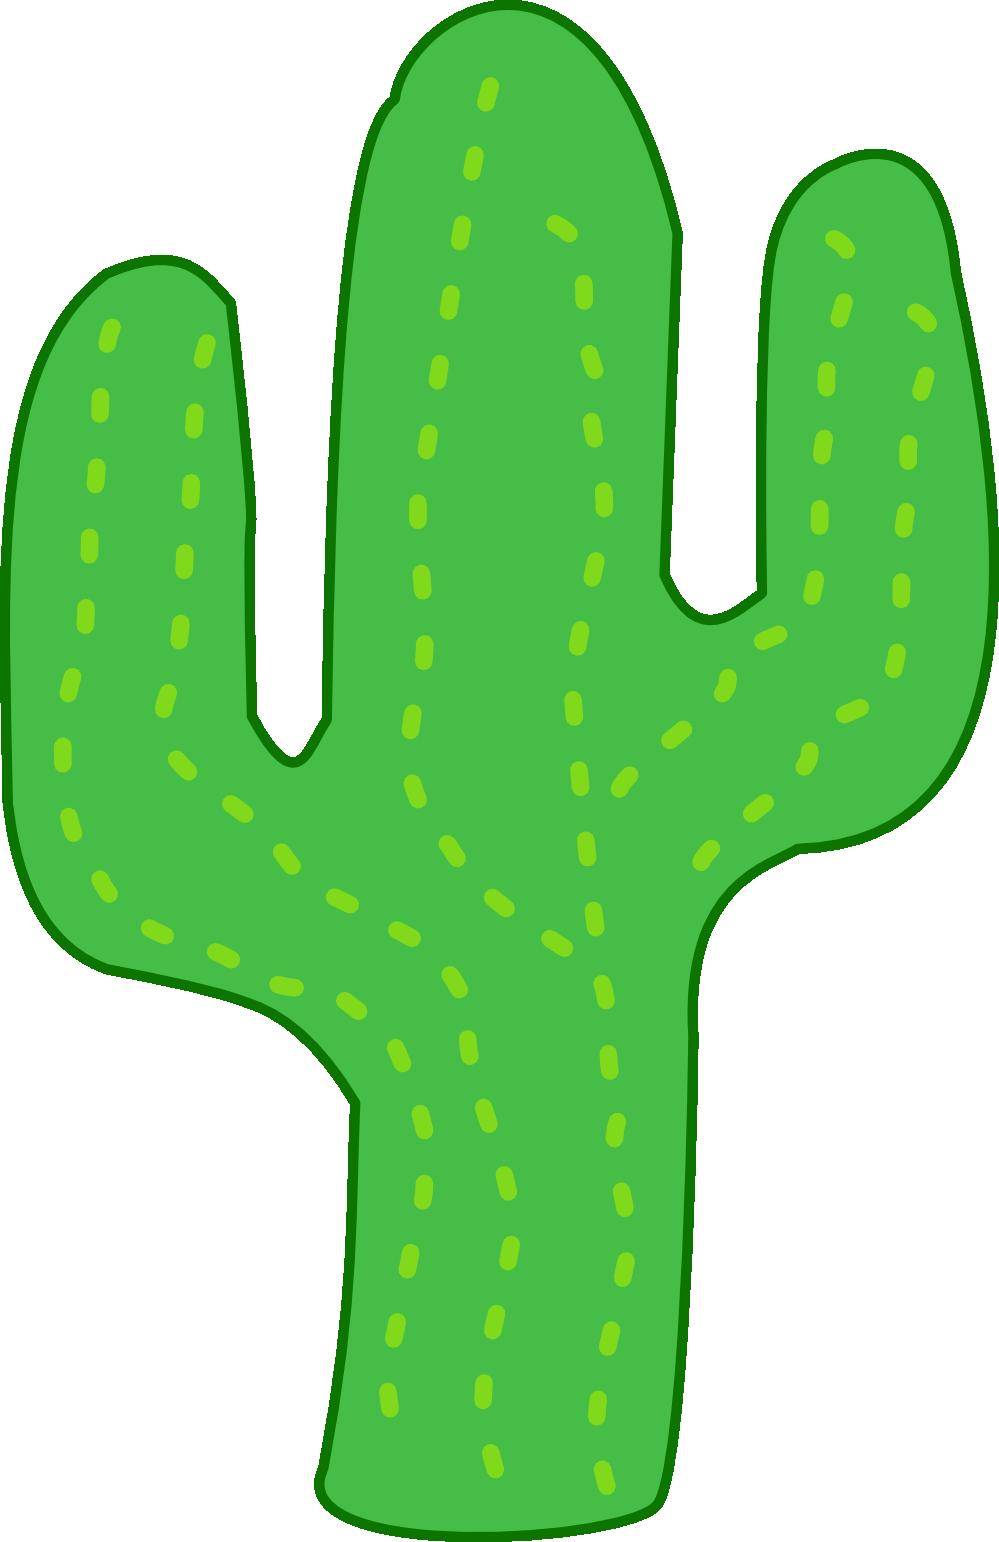 Mexico clipart nopal. Cactus panda free images